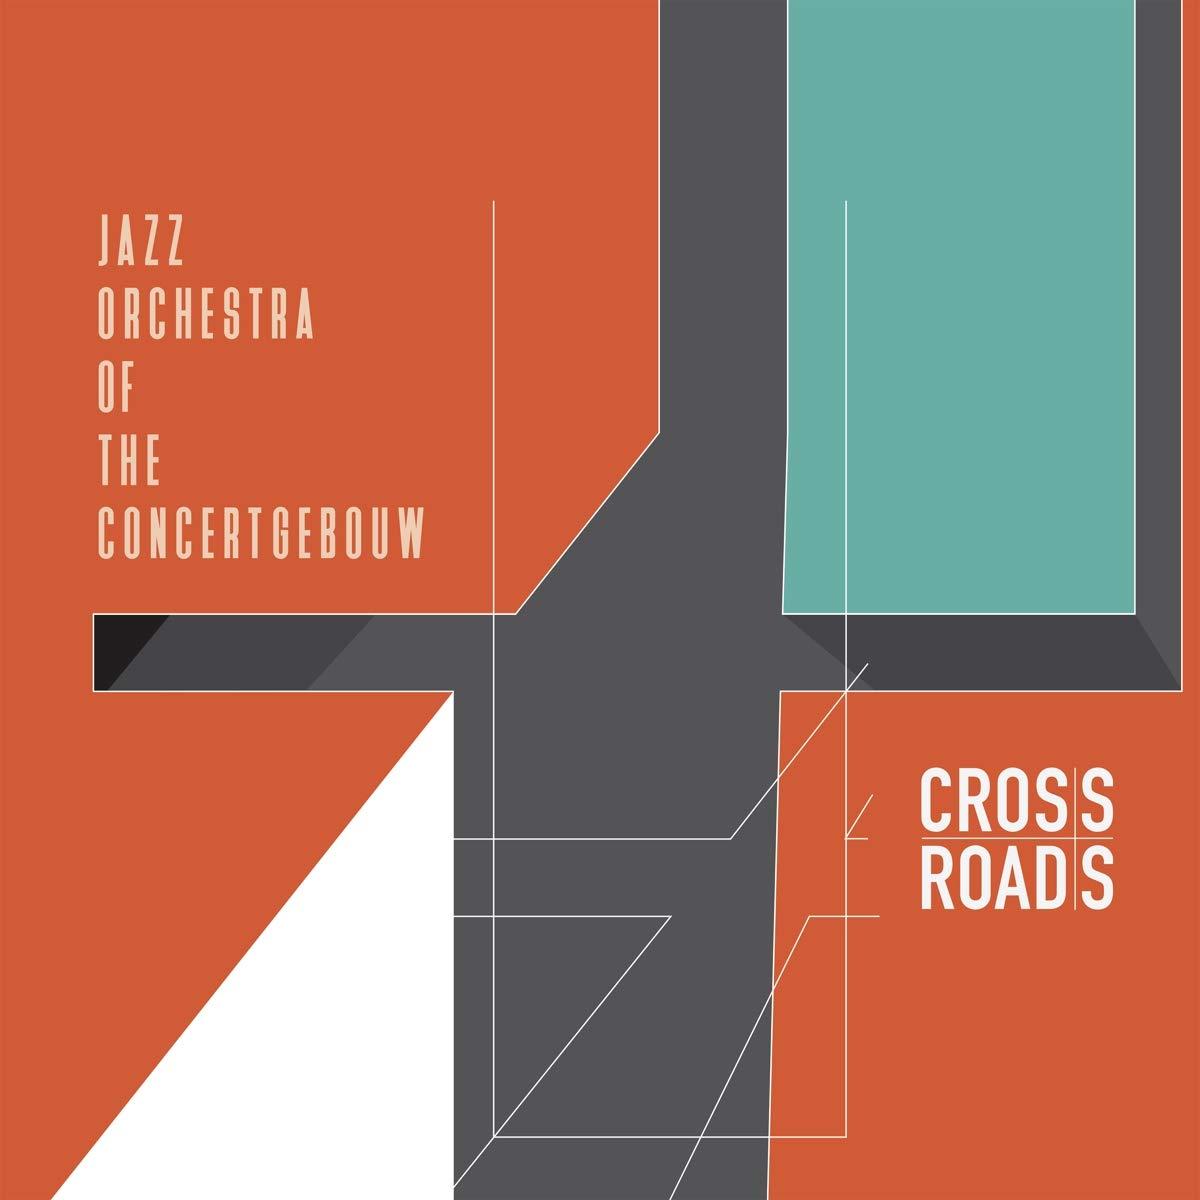 Vinilo : VARIOUS ARTISTS - Crossroads (2 Pack)